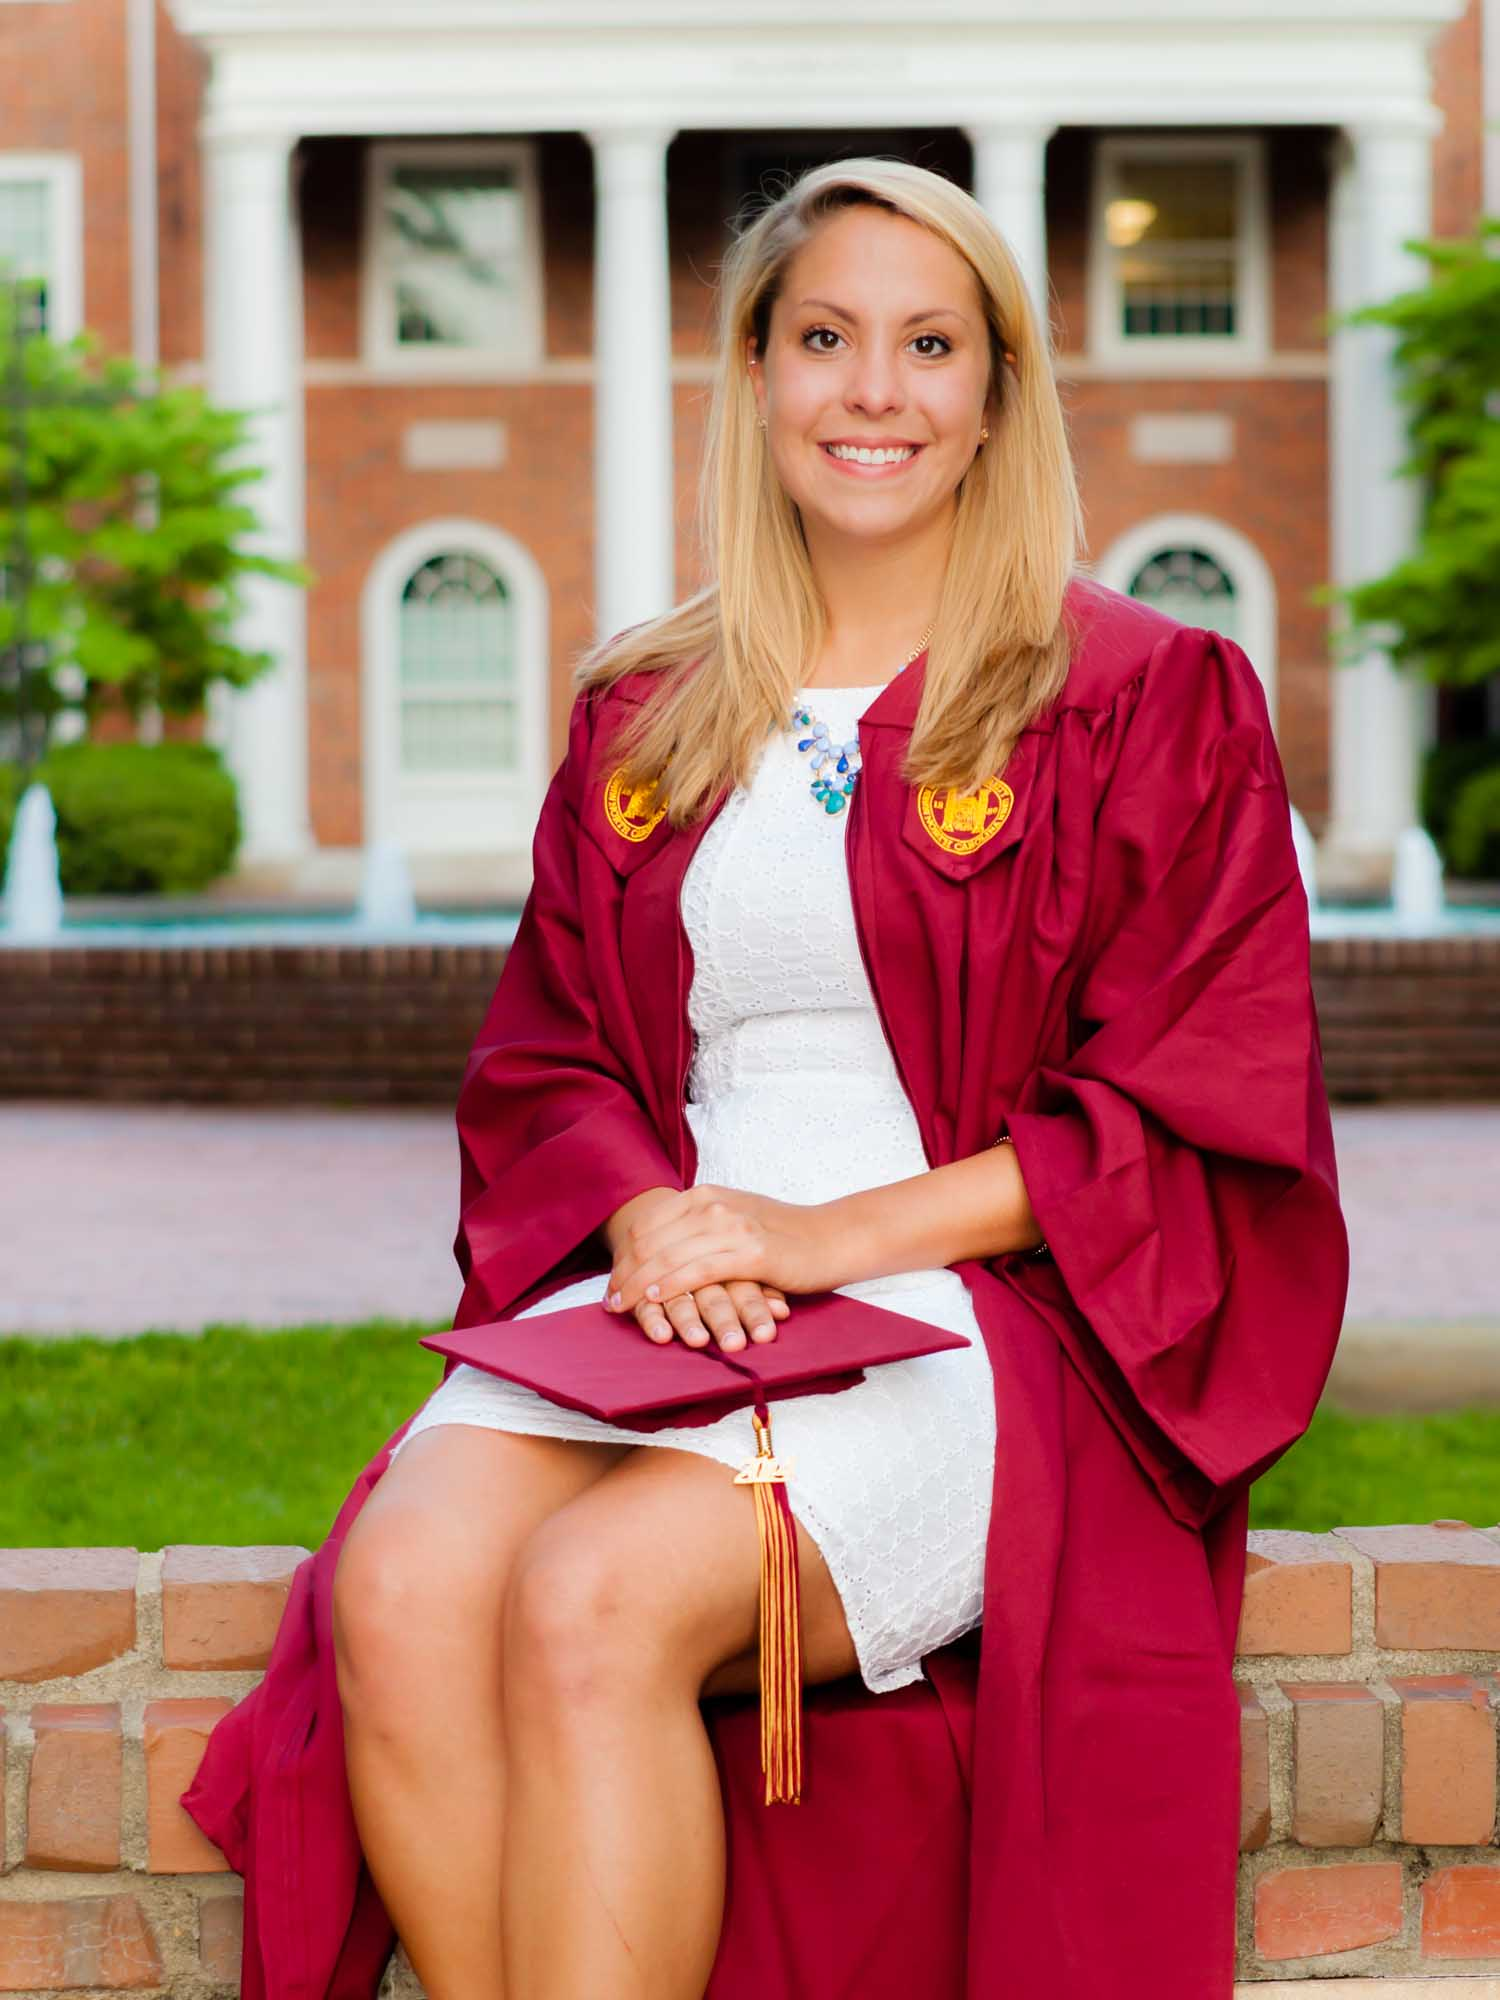 569-Becca & Friends Elon Graduation Portraits_.jpg